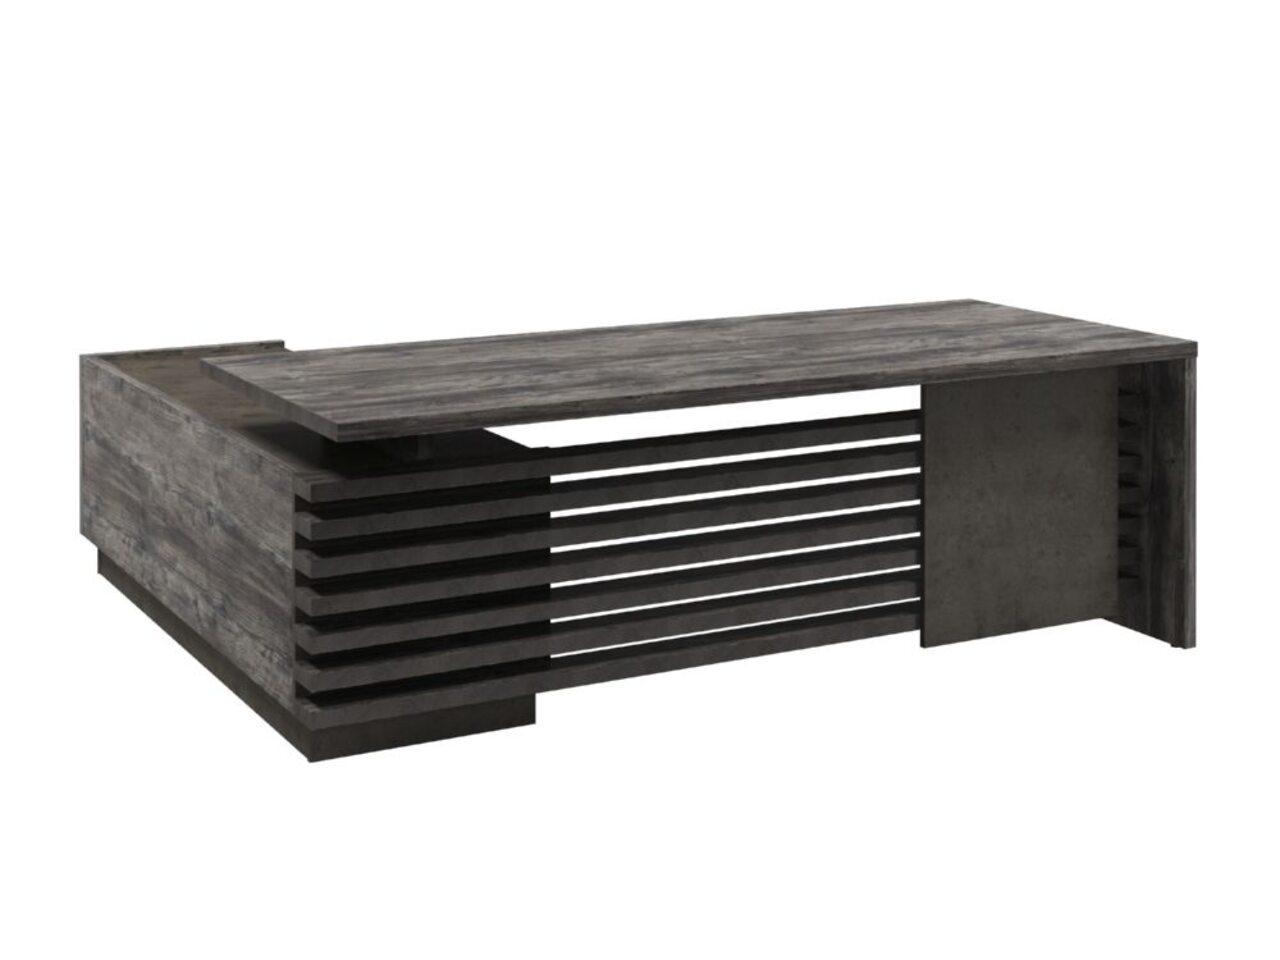 Стол с опорной тумбой  Vestar 220x203x75 - фото 3